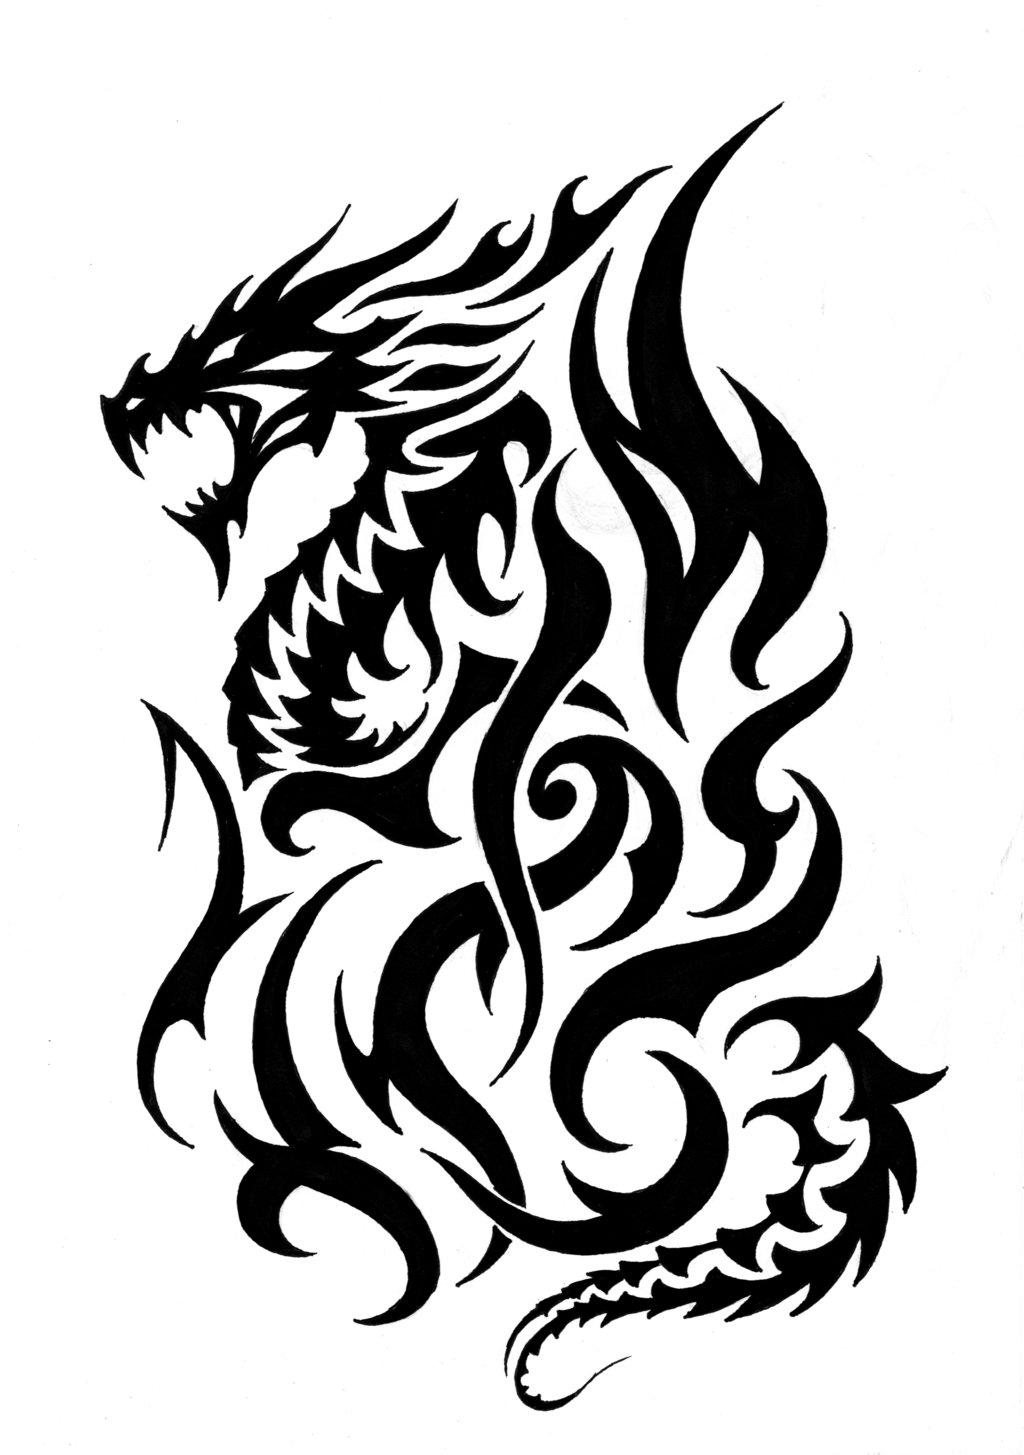 Tribal-Tattoos yTk6MX98c